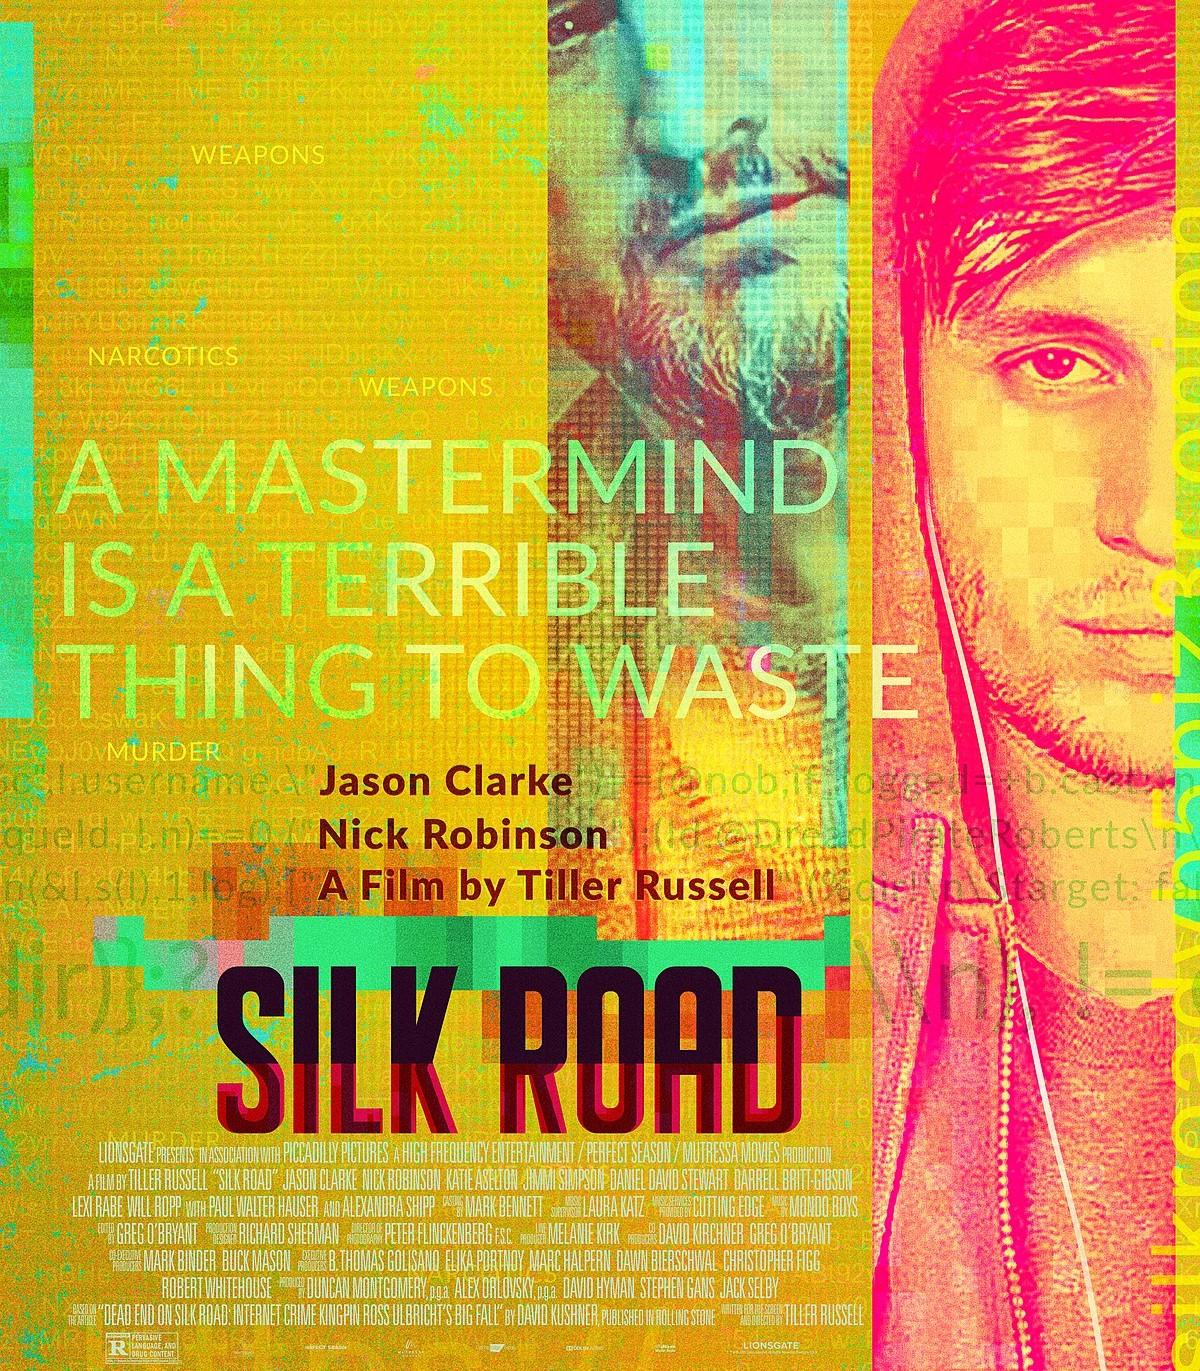 [FILM] Silk Road